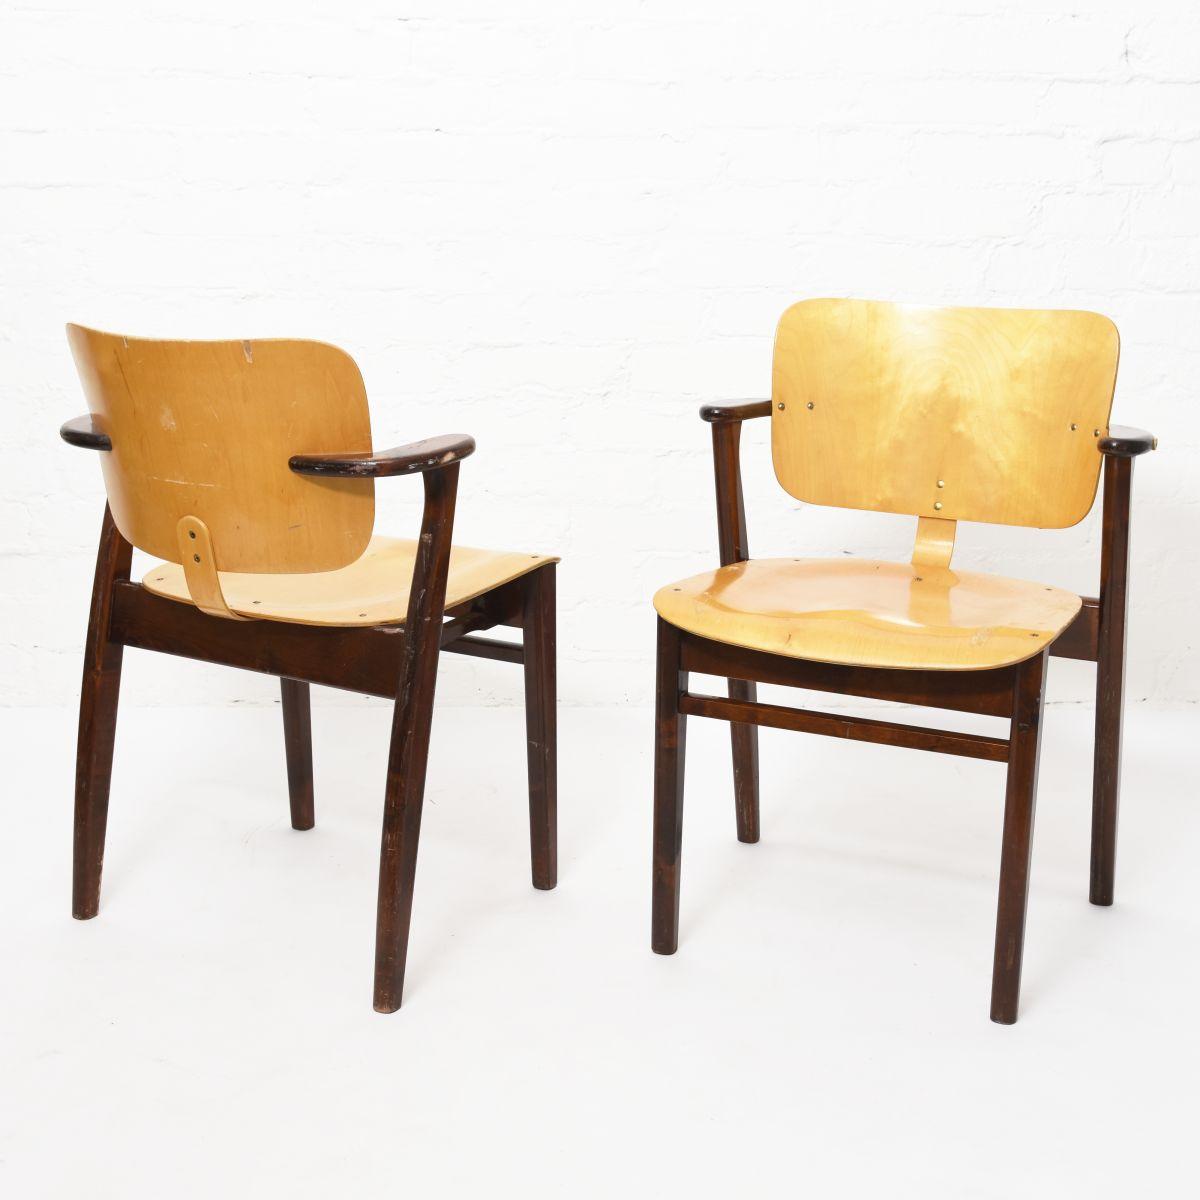 Tapiovaara-Ilmari-Domus-Chair-Dark-Honey-Stain